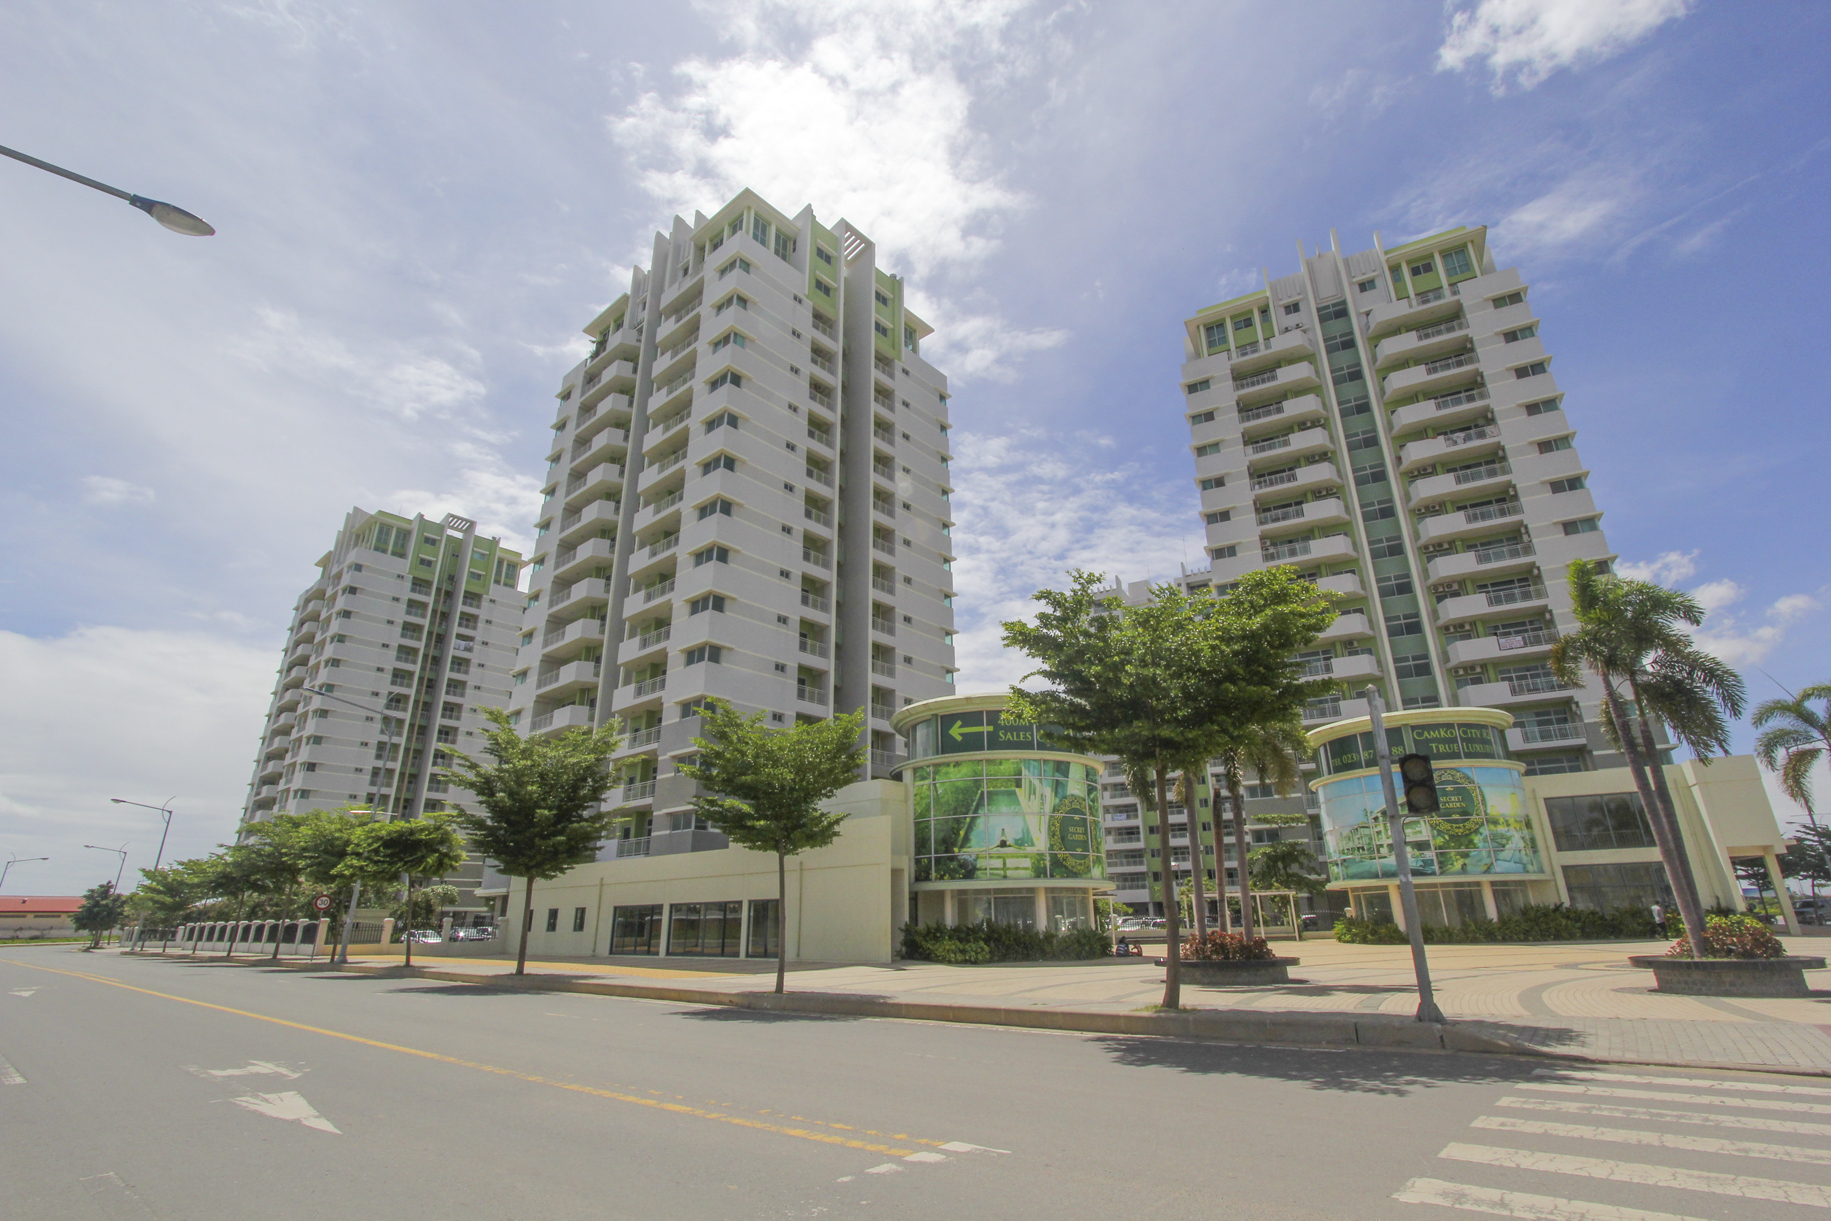 CAMKO CITY CONDOMINIUM BUILDING A101  - TOUL SANGKE